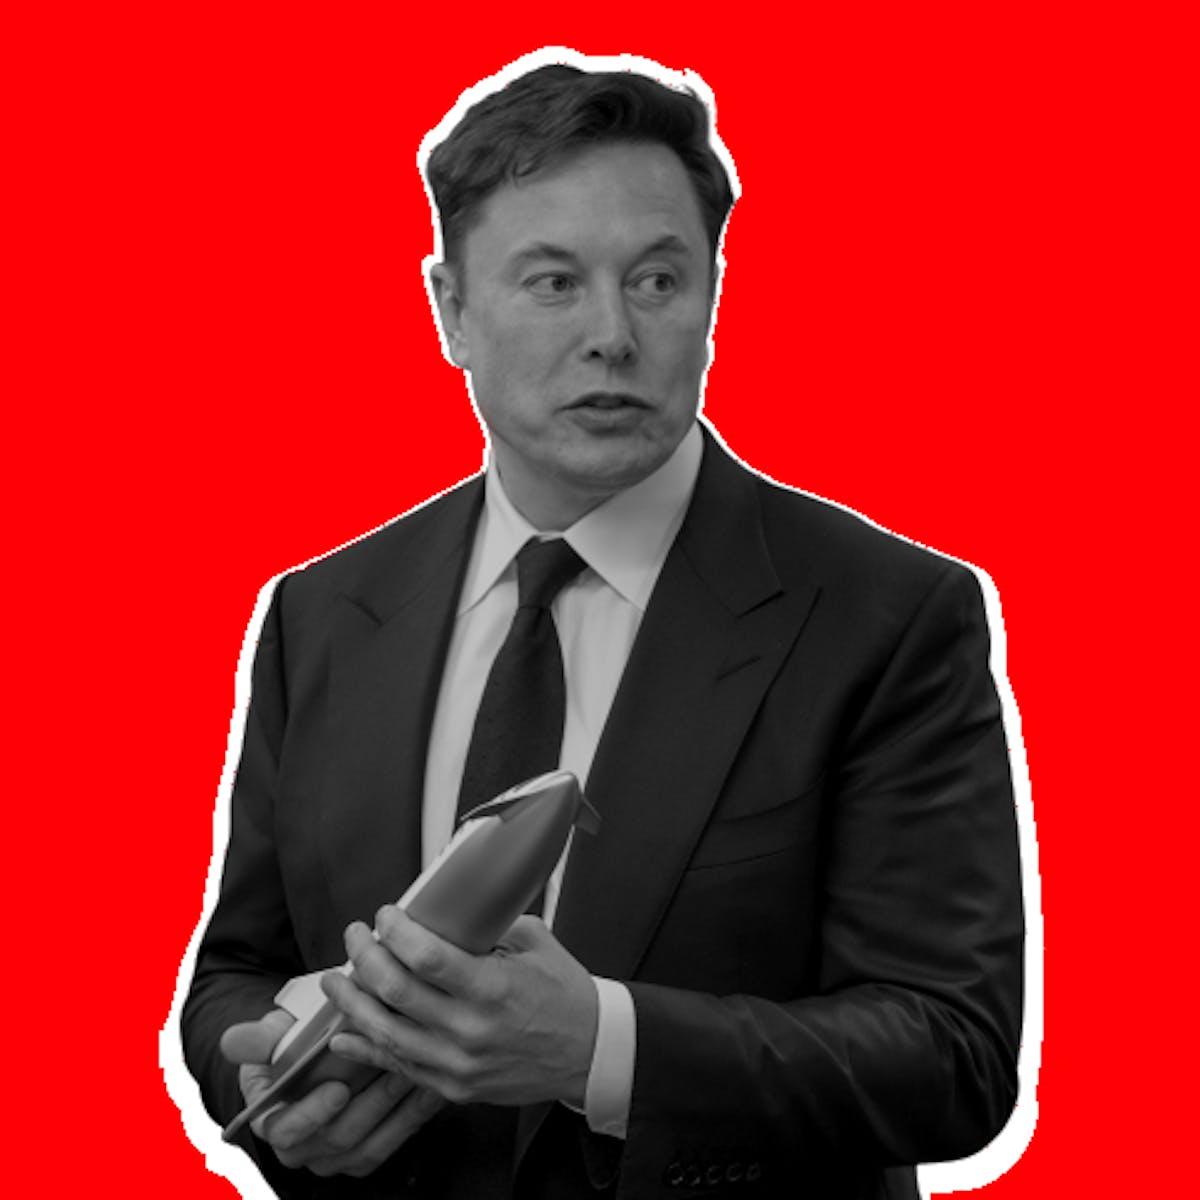 Elon Musk Warns Jack Ma About Super-Intelligent A.I.: 'Famous Last Words'